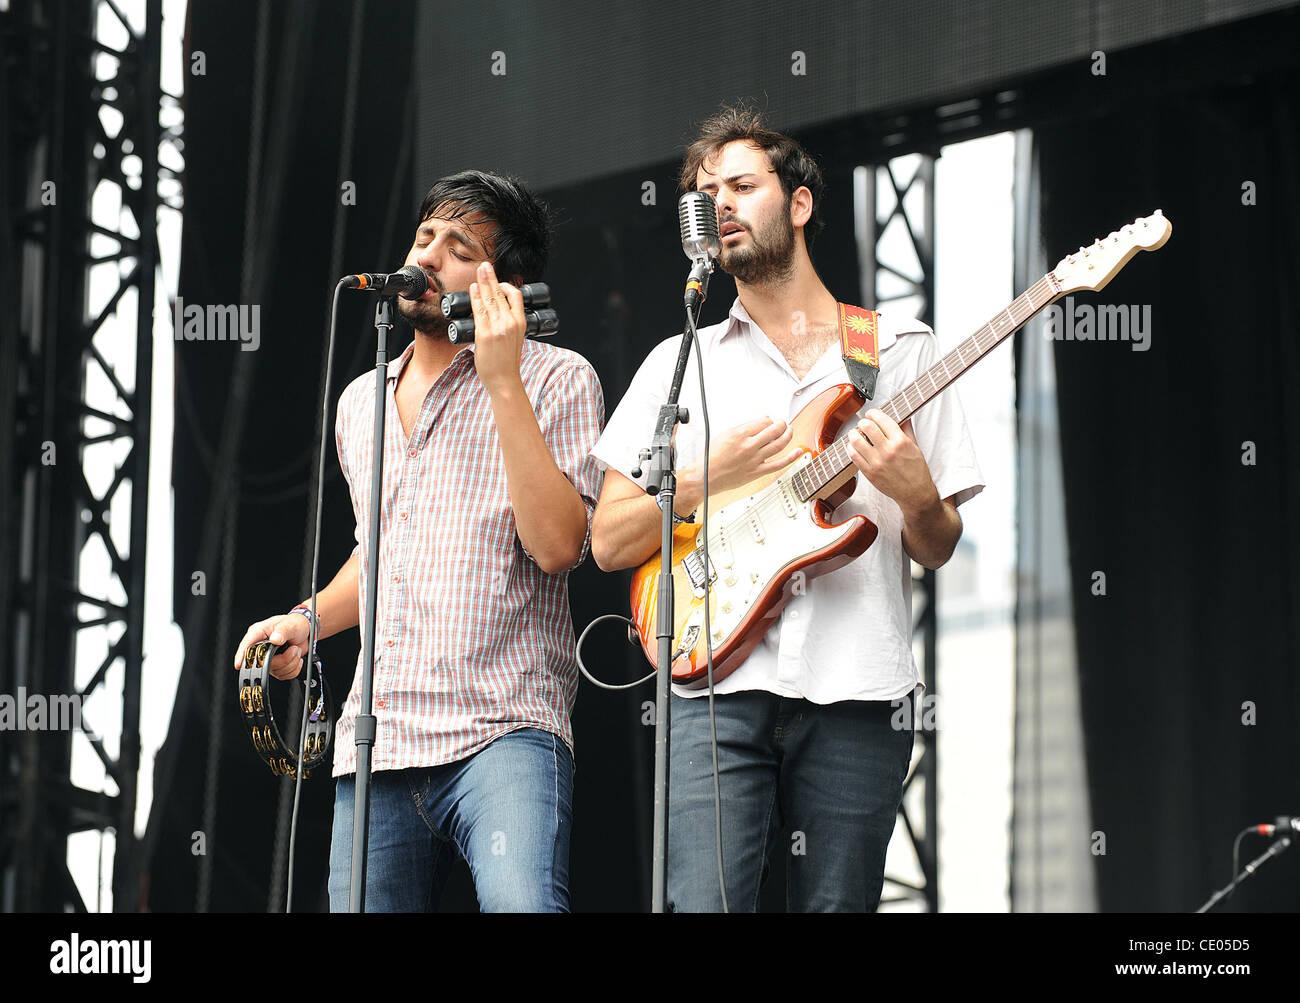 Aug 5, 2011 - Chicago, Illinois; USA - Singer SAMEER GADHIA and Guitarist ERIC CANNATA of the band Young The Giant - Stock Image